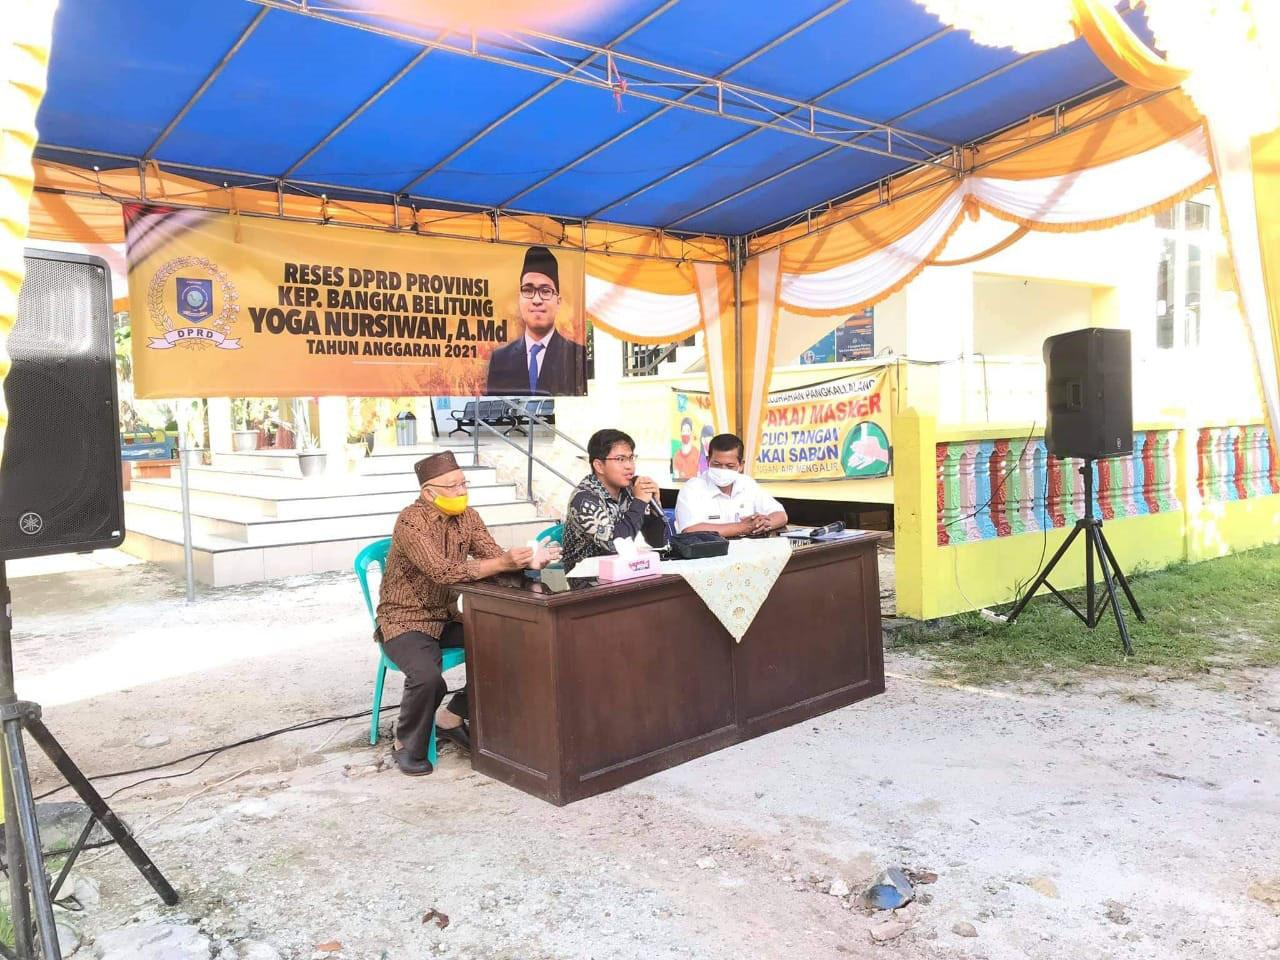 Gelar Reses, Politisi Golkar Yoga Nusirwan Sambut Aspirasi Masyarakat Belitung